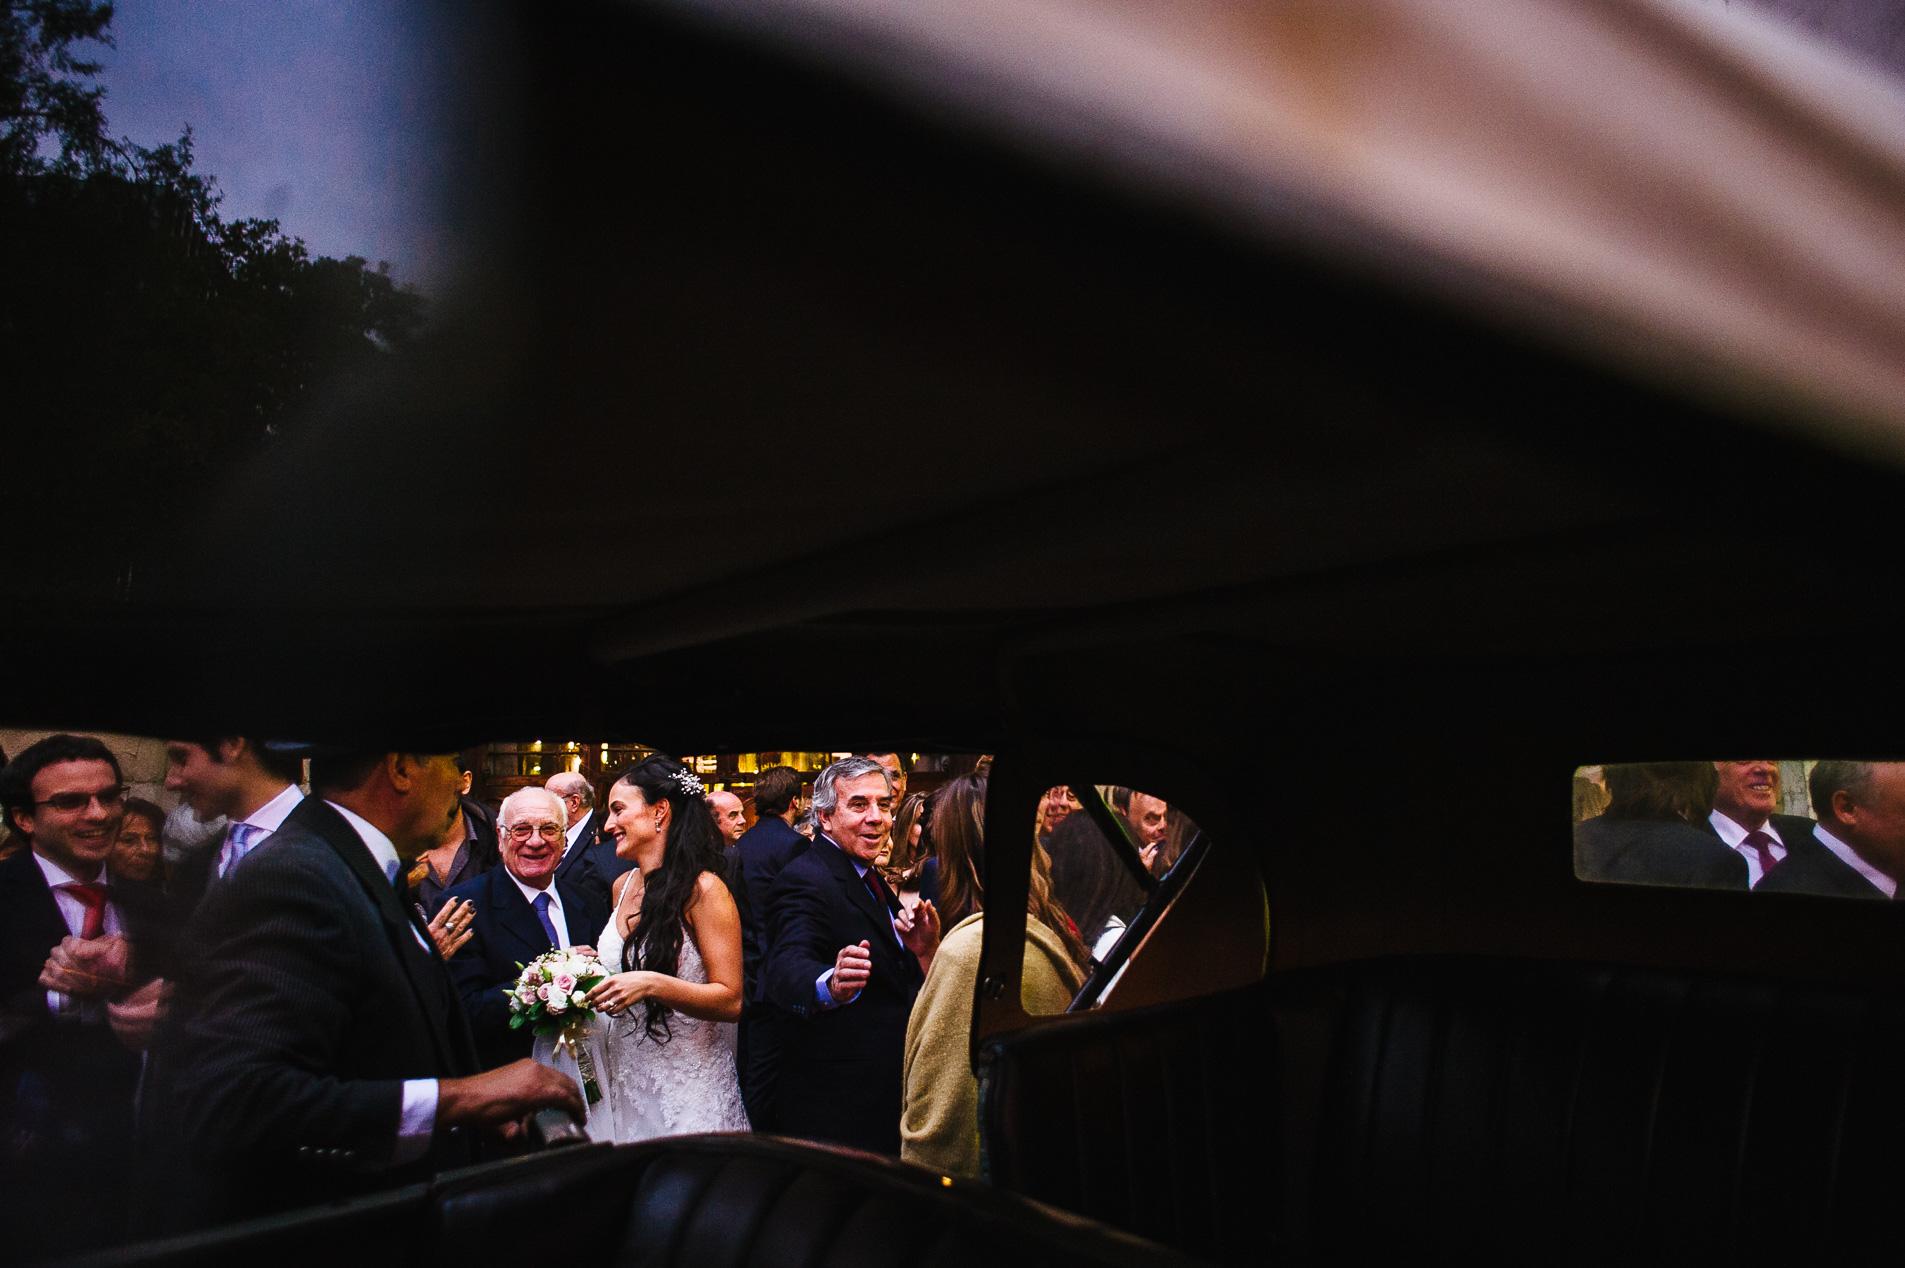 Dani-Cristian-fotos-matrimonio-34